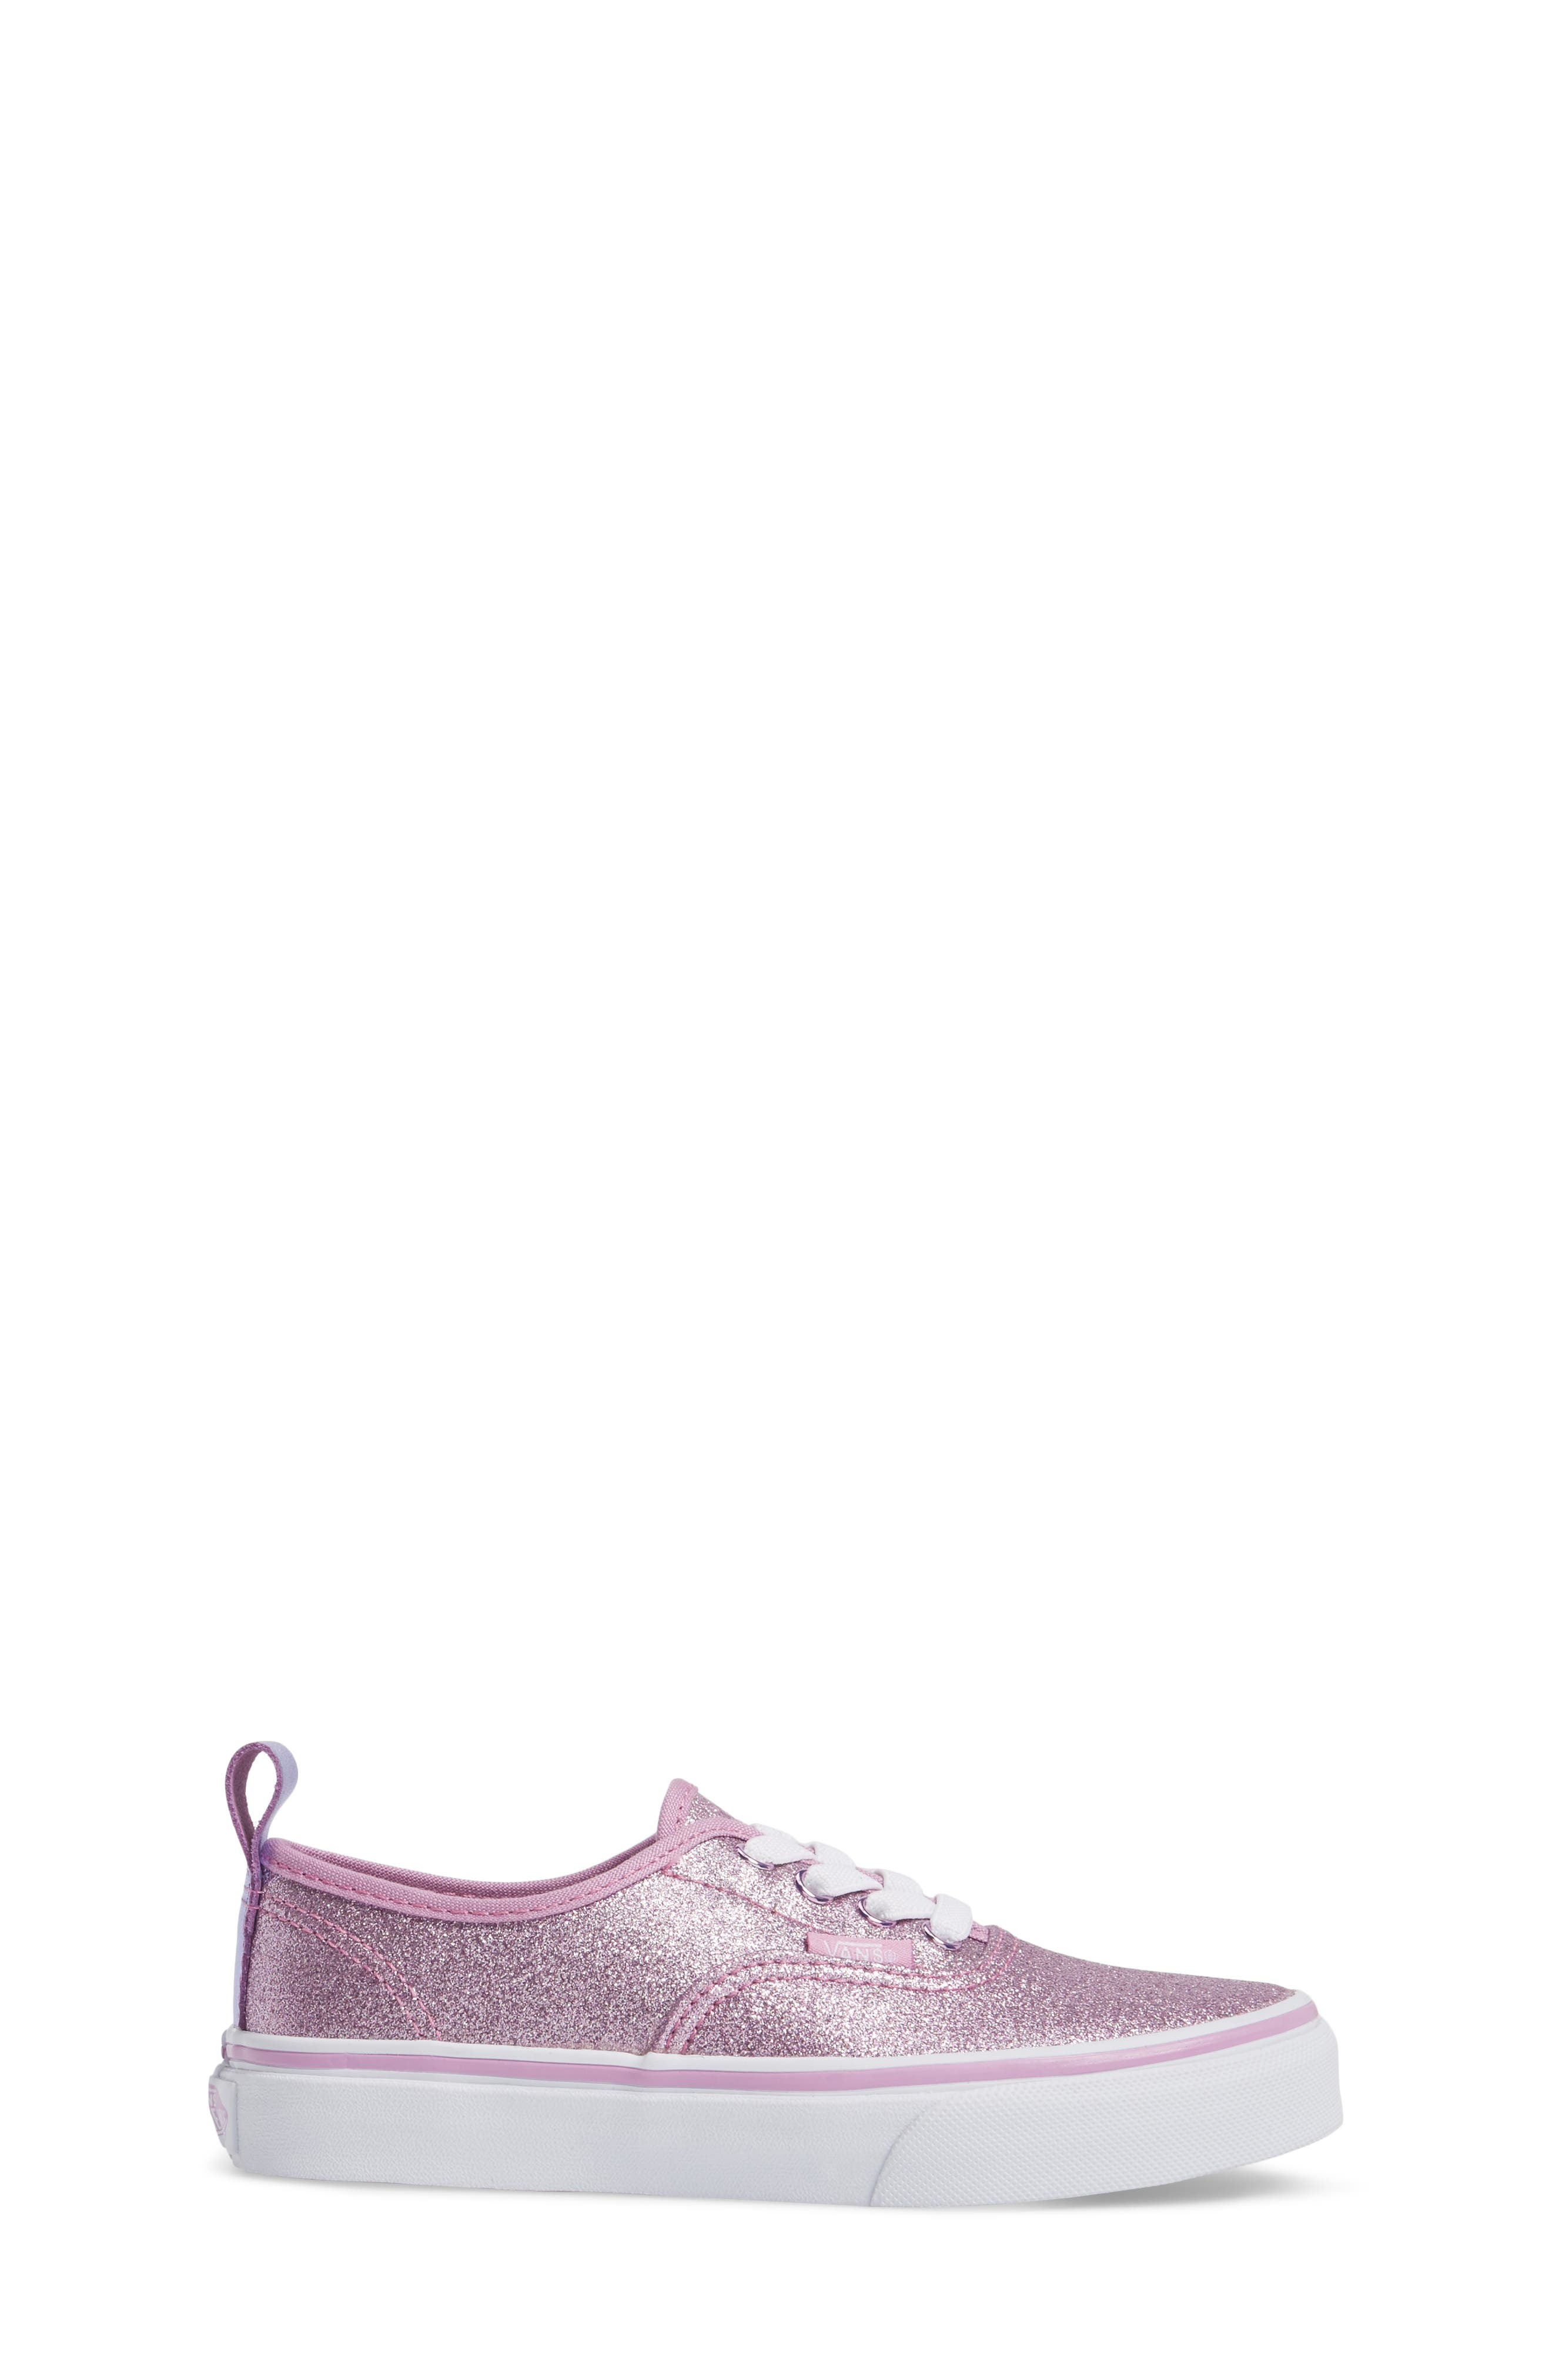 Alternate Image 3  - Vans Glitter Authentic Elastic Lace Sneaker (Baby, Walker, Toddler, Little Kid & Big Kid)